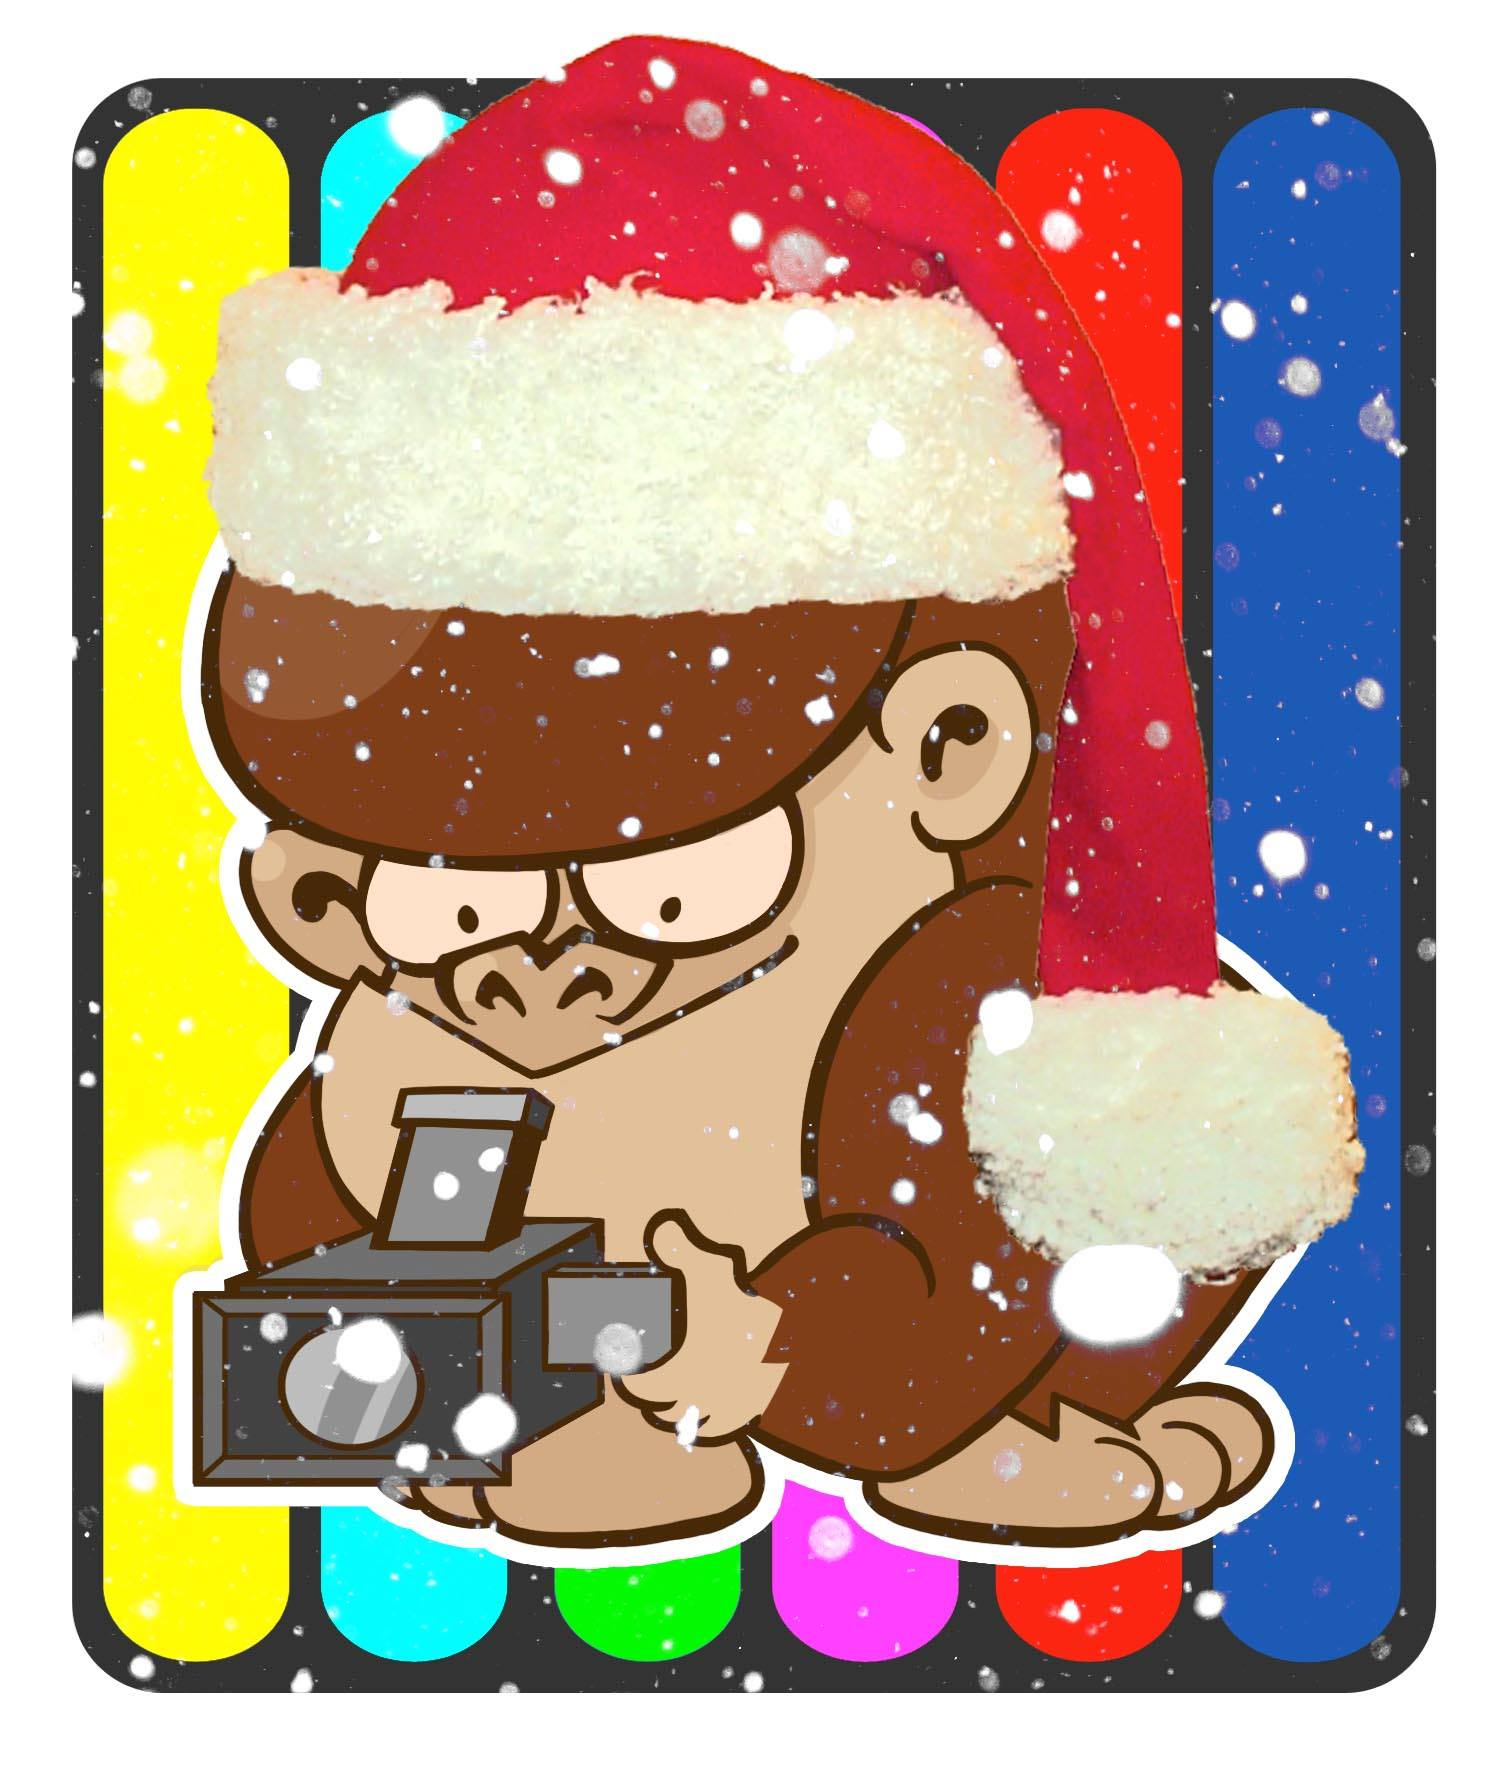 guerrillachristmas.jpg